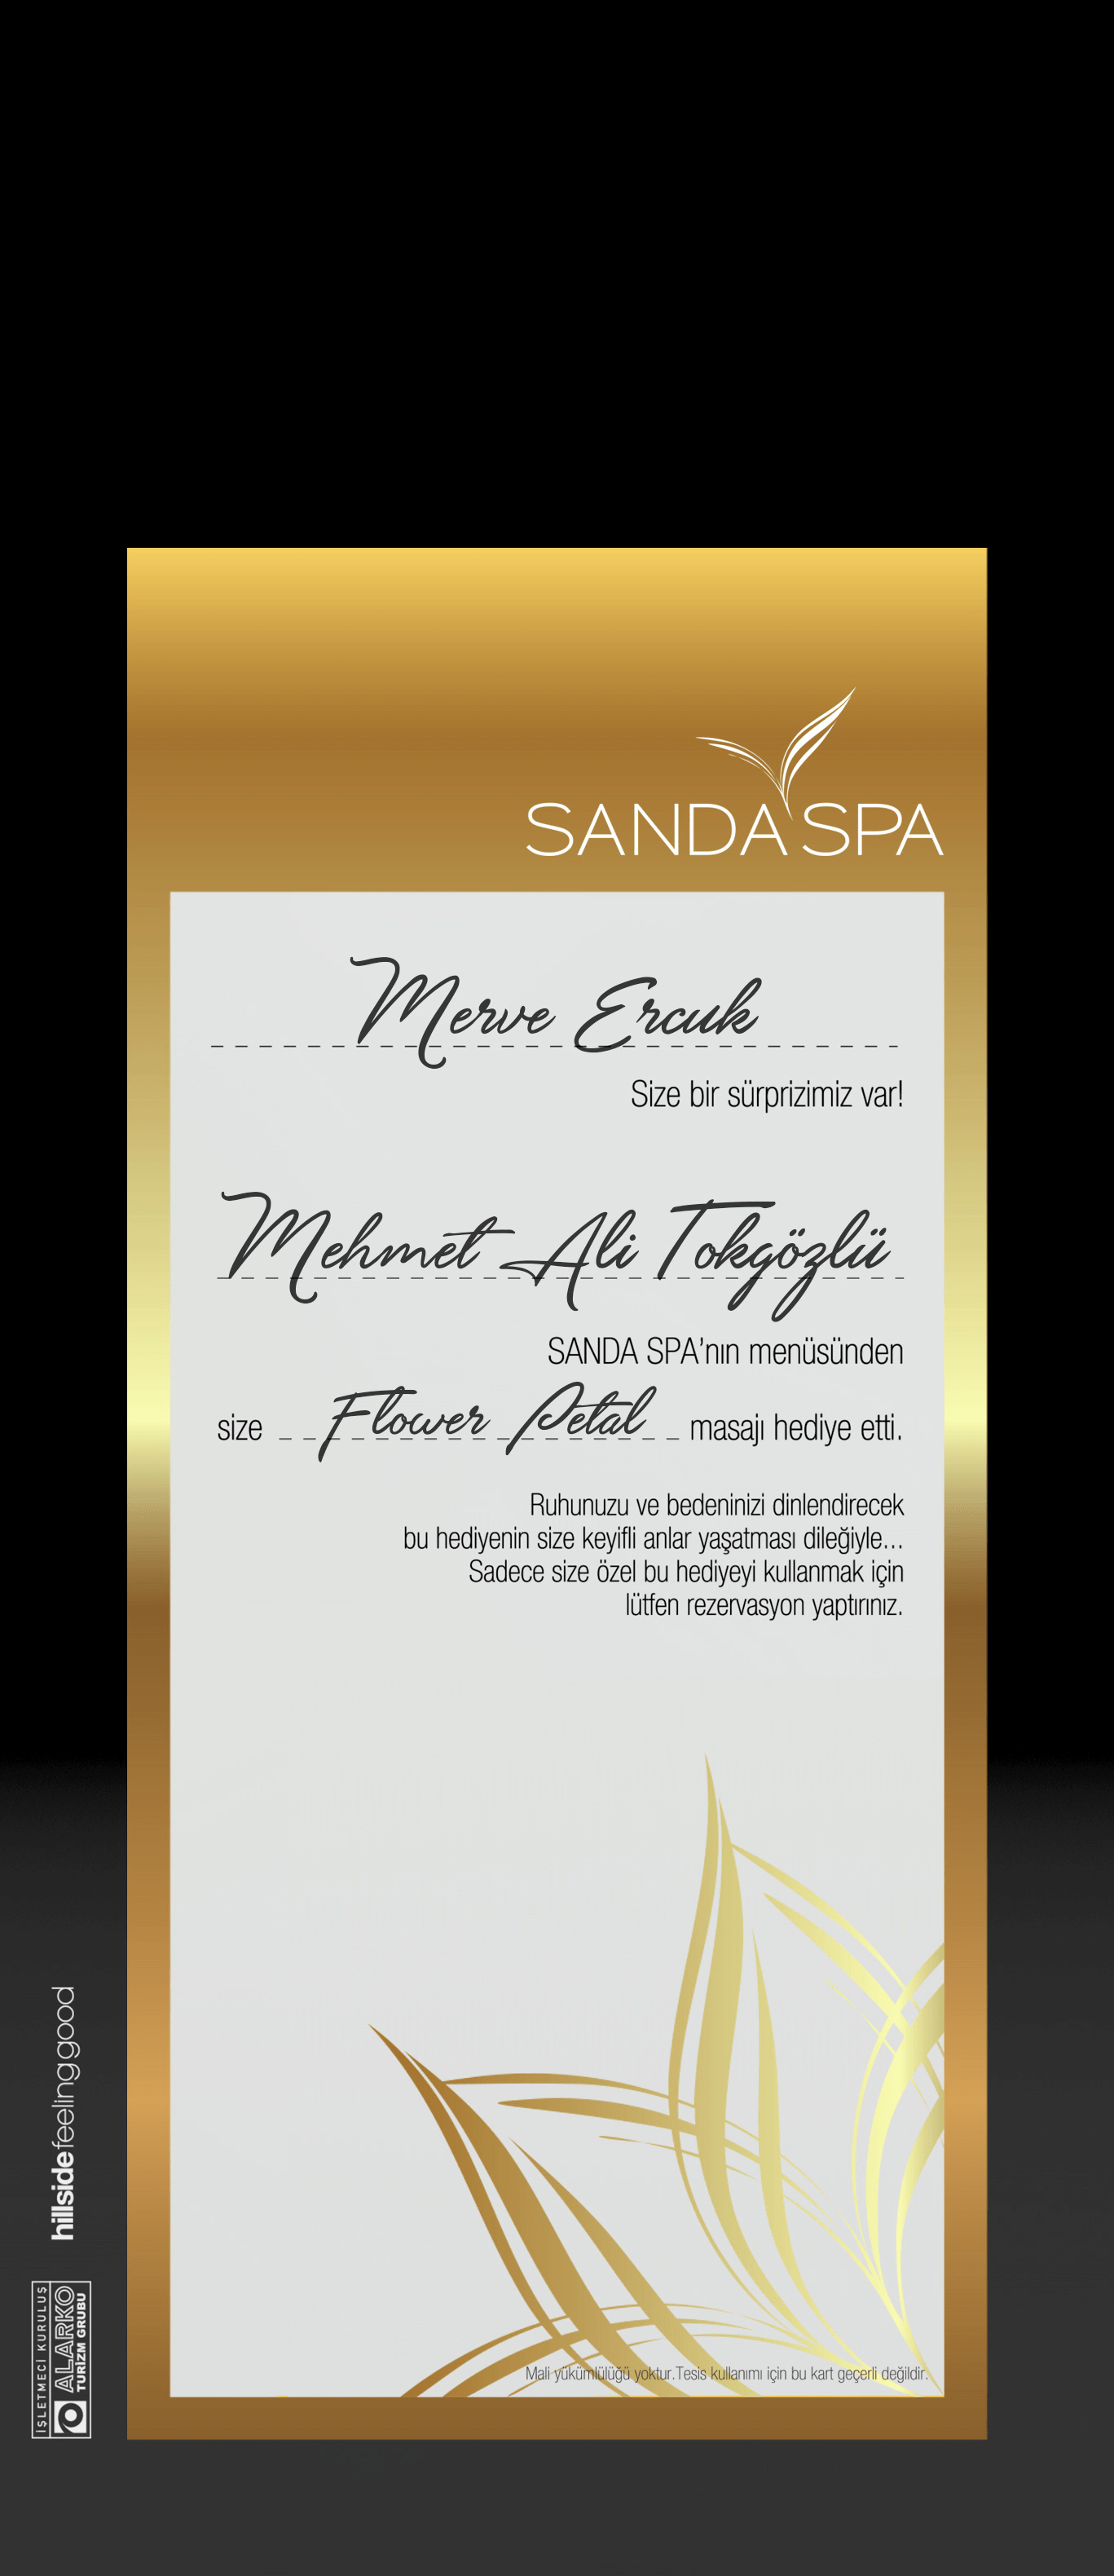 Sanda Spa Gift Card